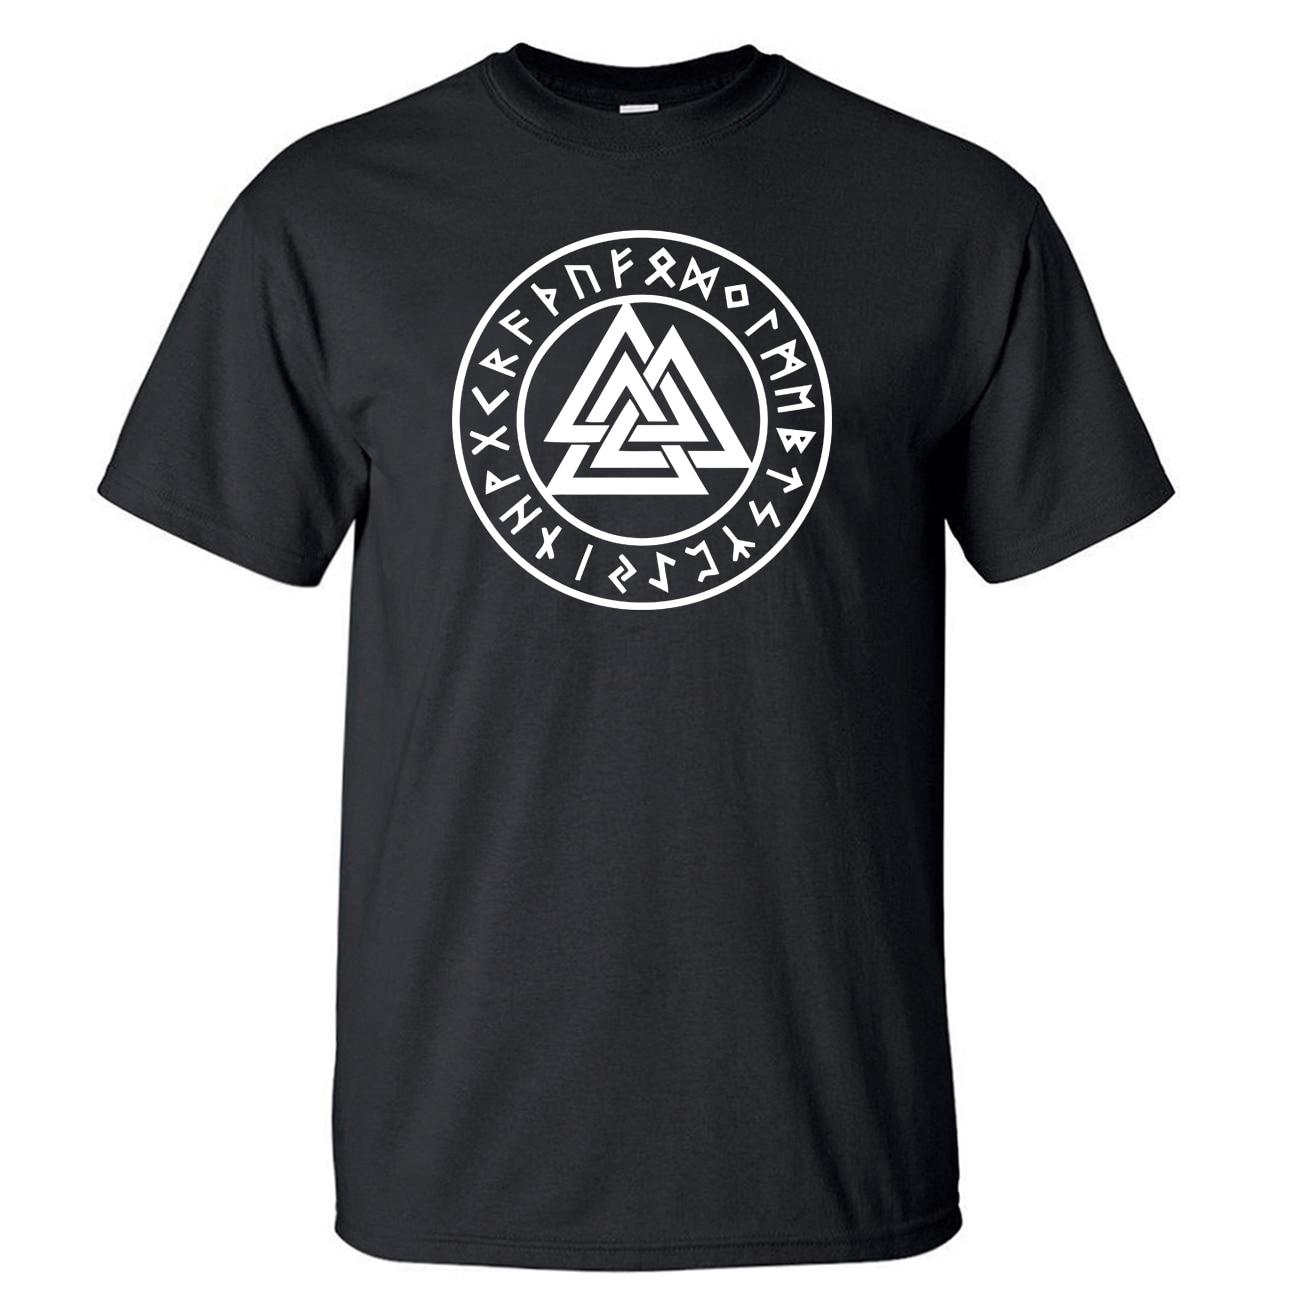 Odin Vikings TShirt Men Lothbrok Lagertha Athelstan T Shirt Summer Tops Short Sleeve Gone To Valhalla Black T-Shirt VikingTees